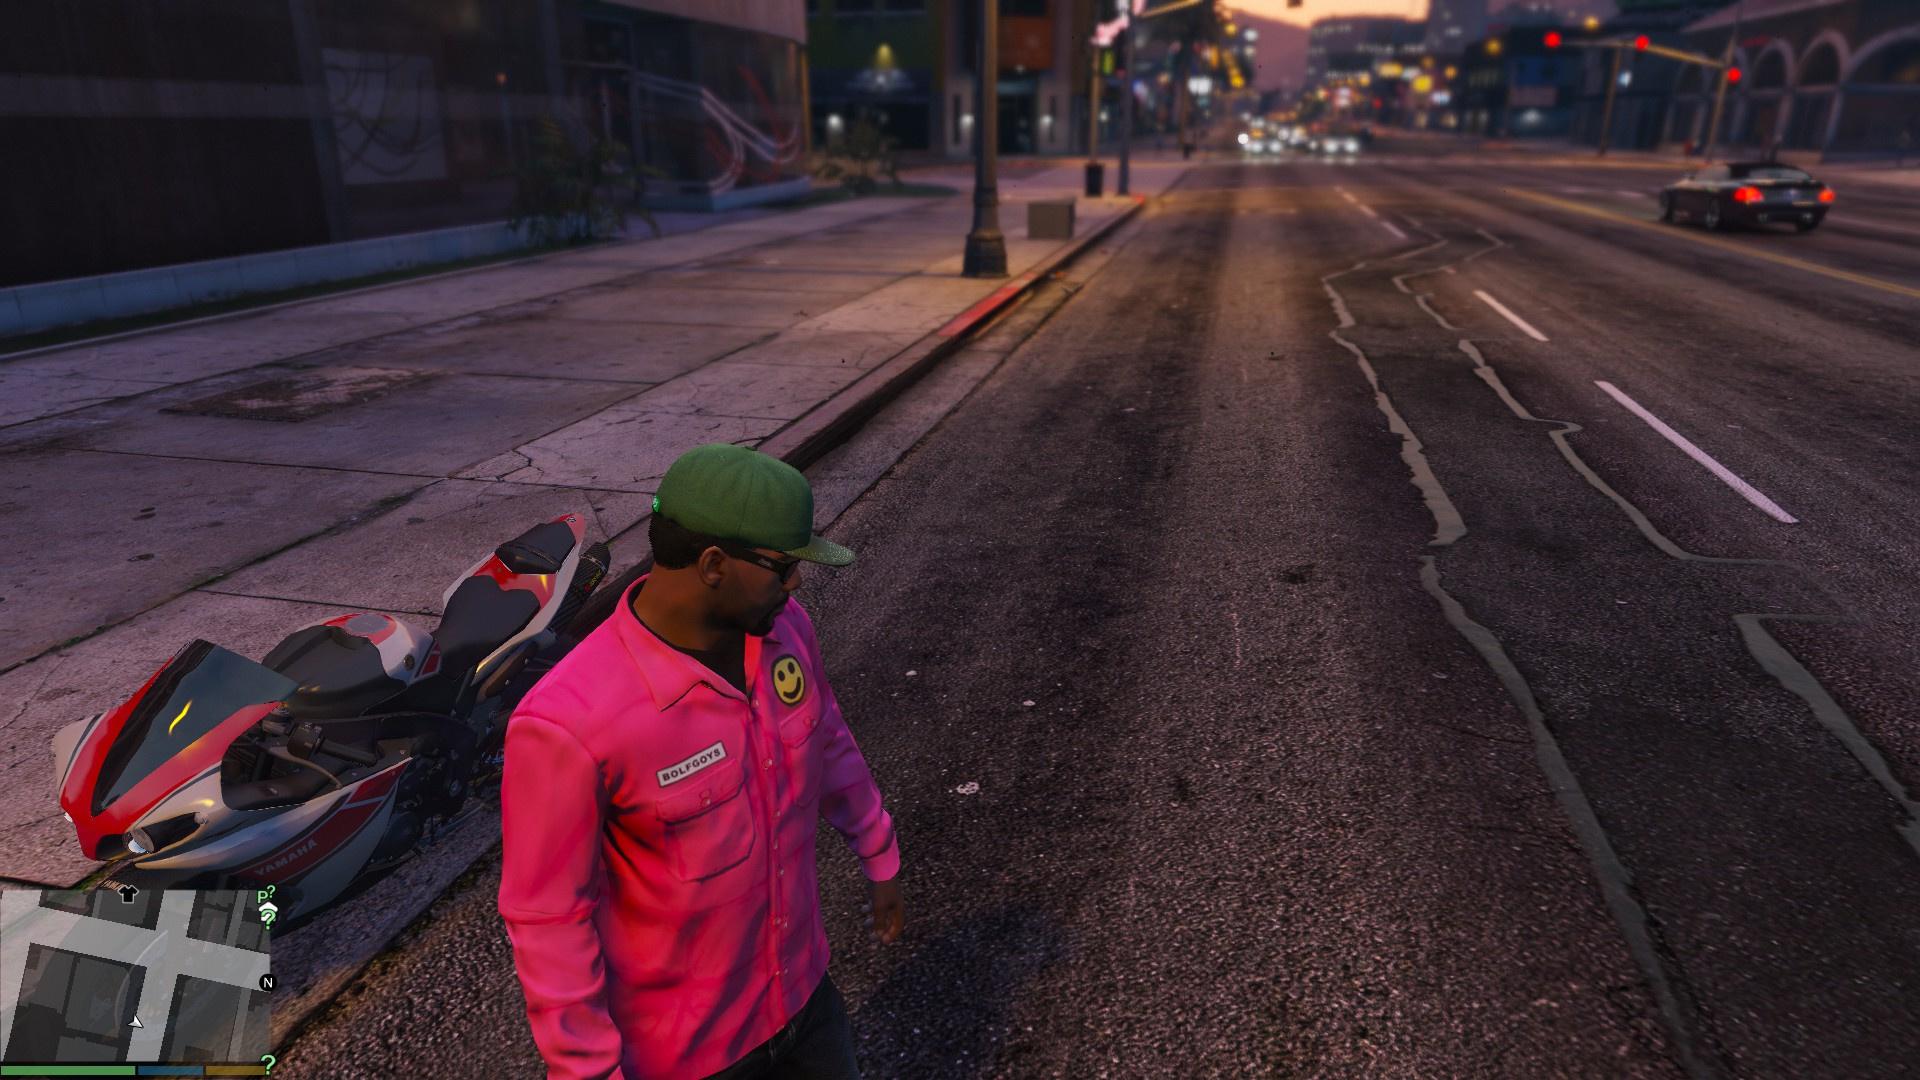 3d Cheetah Wallpaper Bolf Goys Nylon Spring Slim Fit Jacket Pink Golf Wang